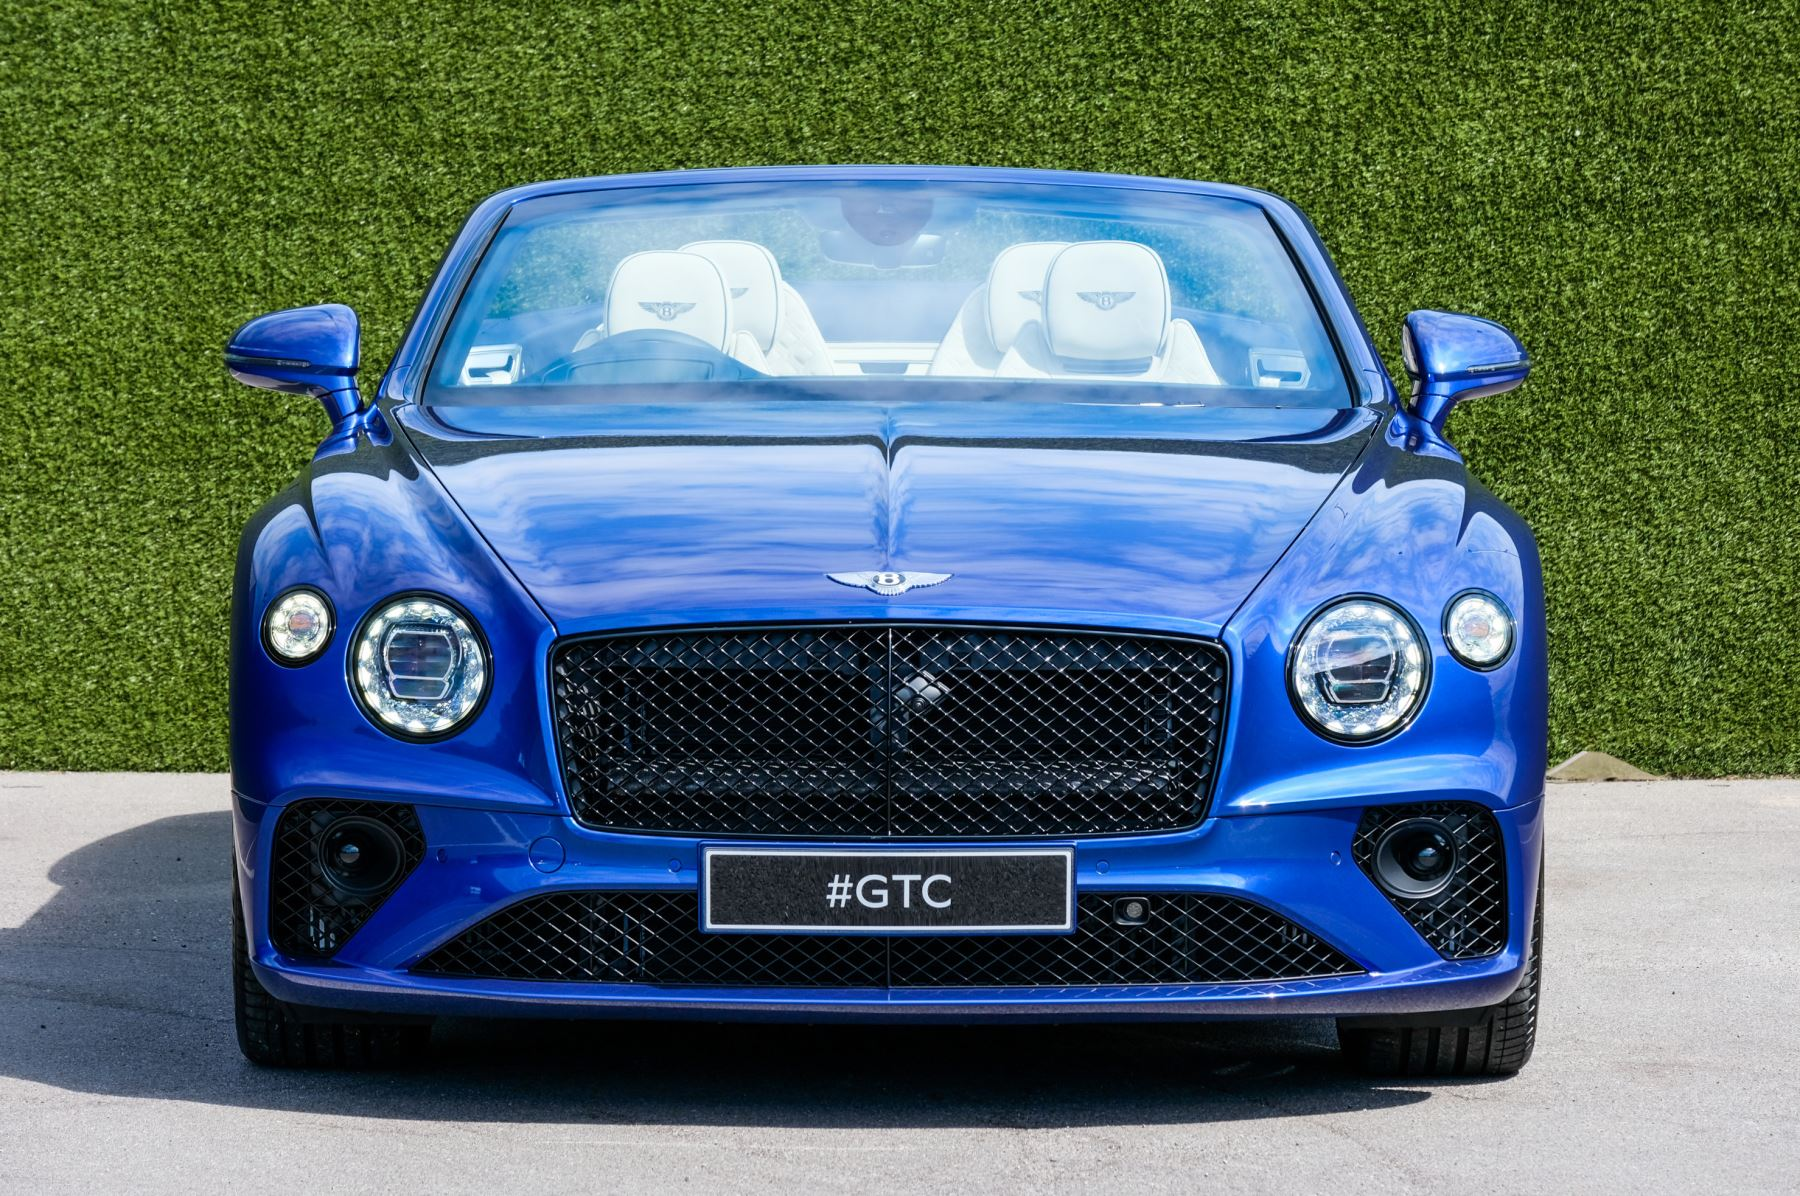 Bentley Continental GTC 4.0 V8 Mulliner Edition 2dr Auto [Tour Spec] image 2